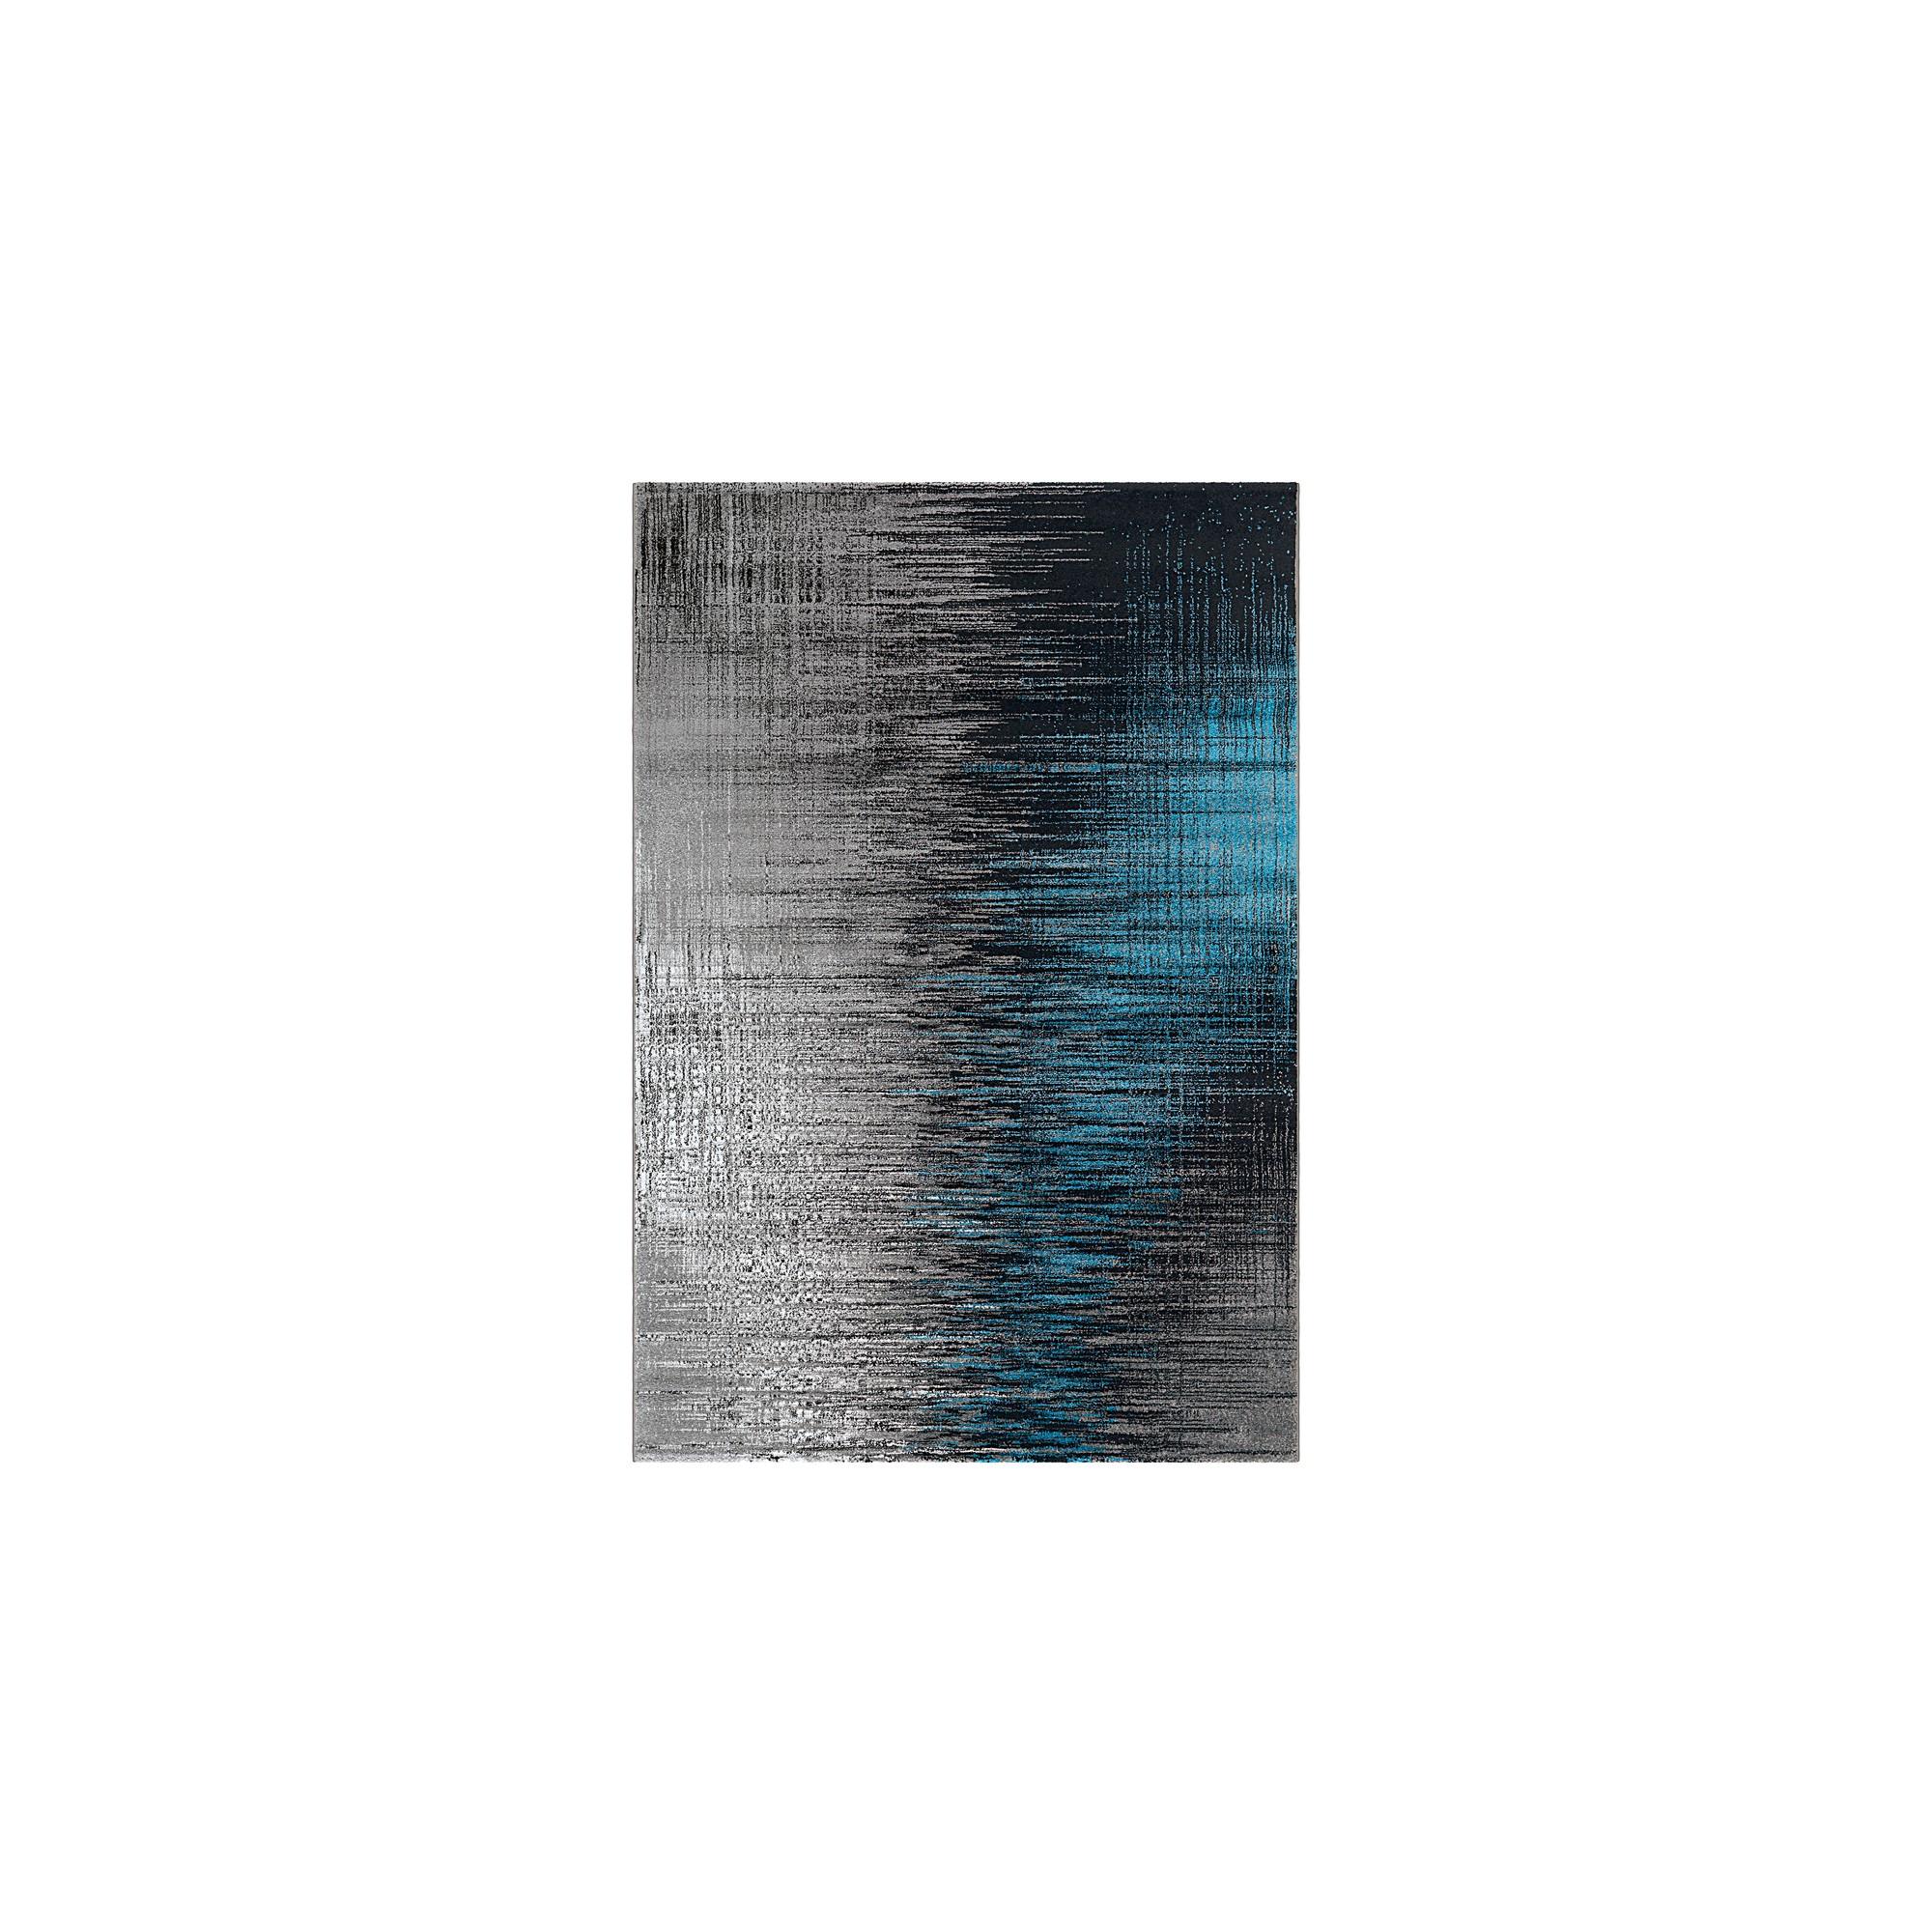 Dywan Arte Espina Move 4453 Grau Blau 240x300cm Polipropylen Design Abstrakcyjny